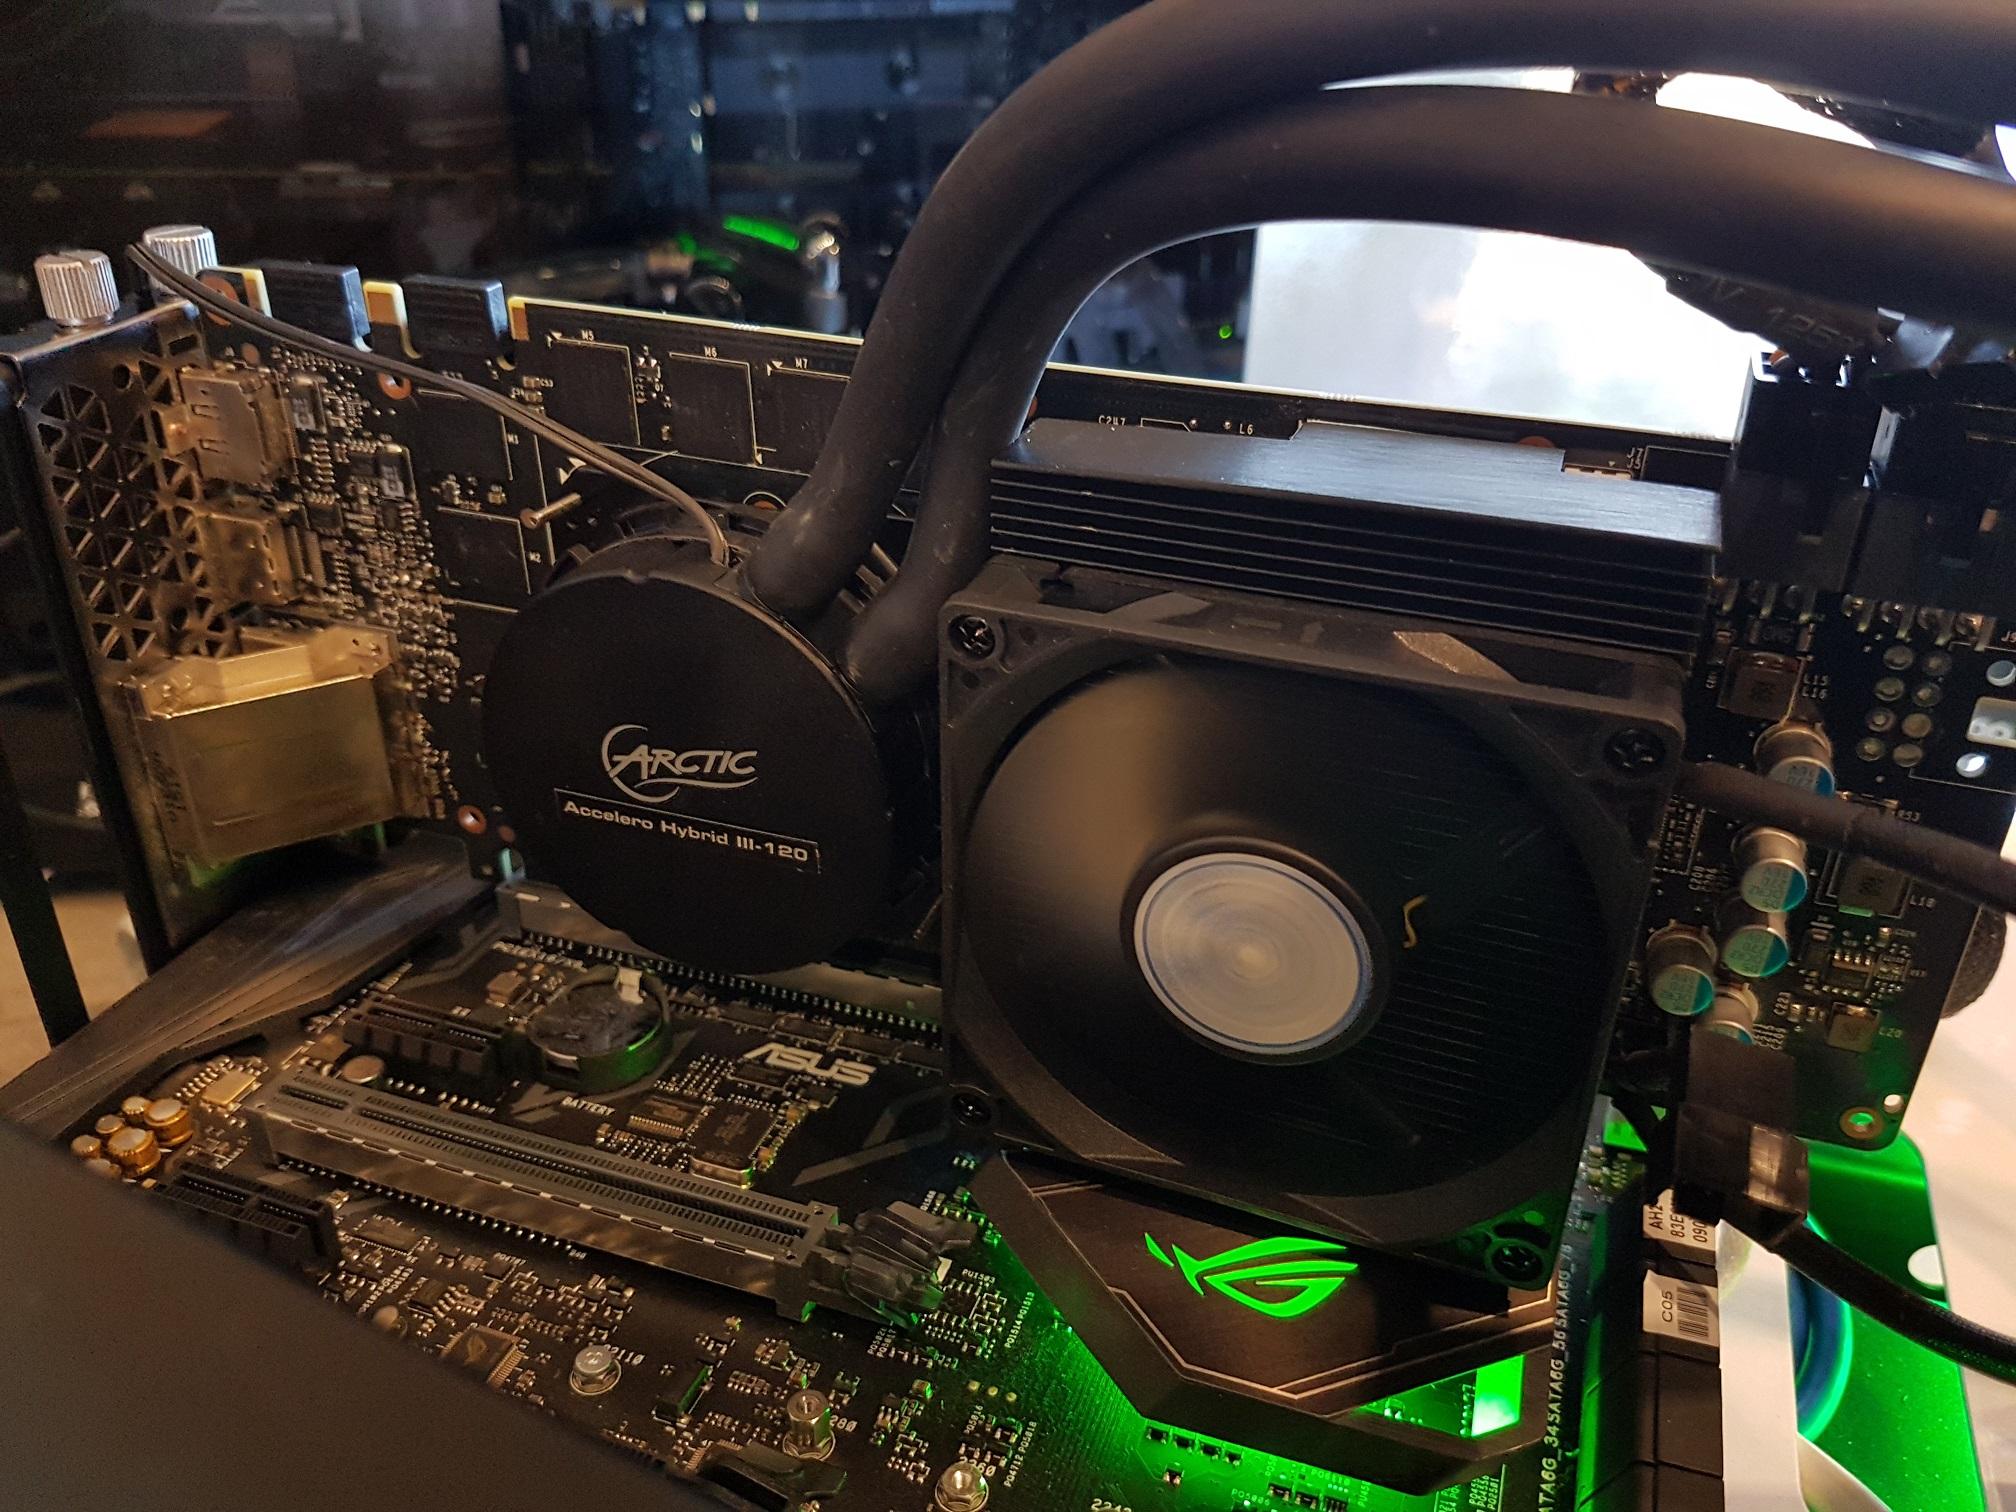 An Arctic Accelero Hybrid III 120 for our Nvidia GTX 980 Ti